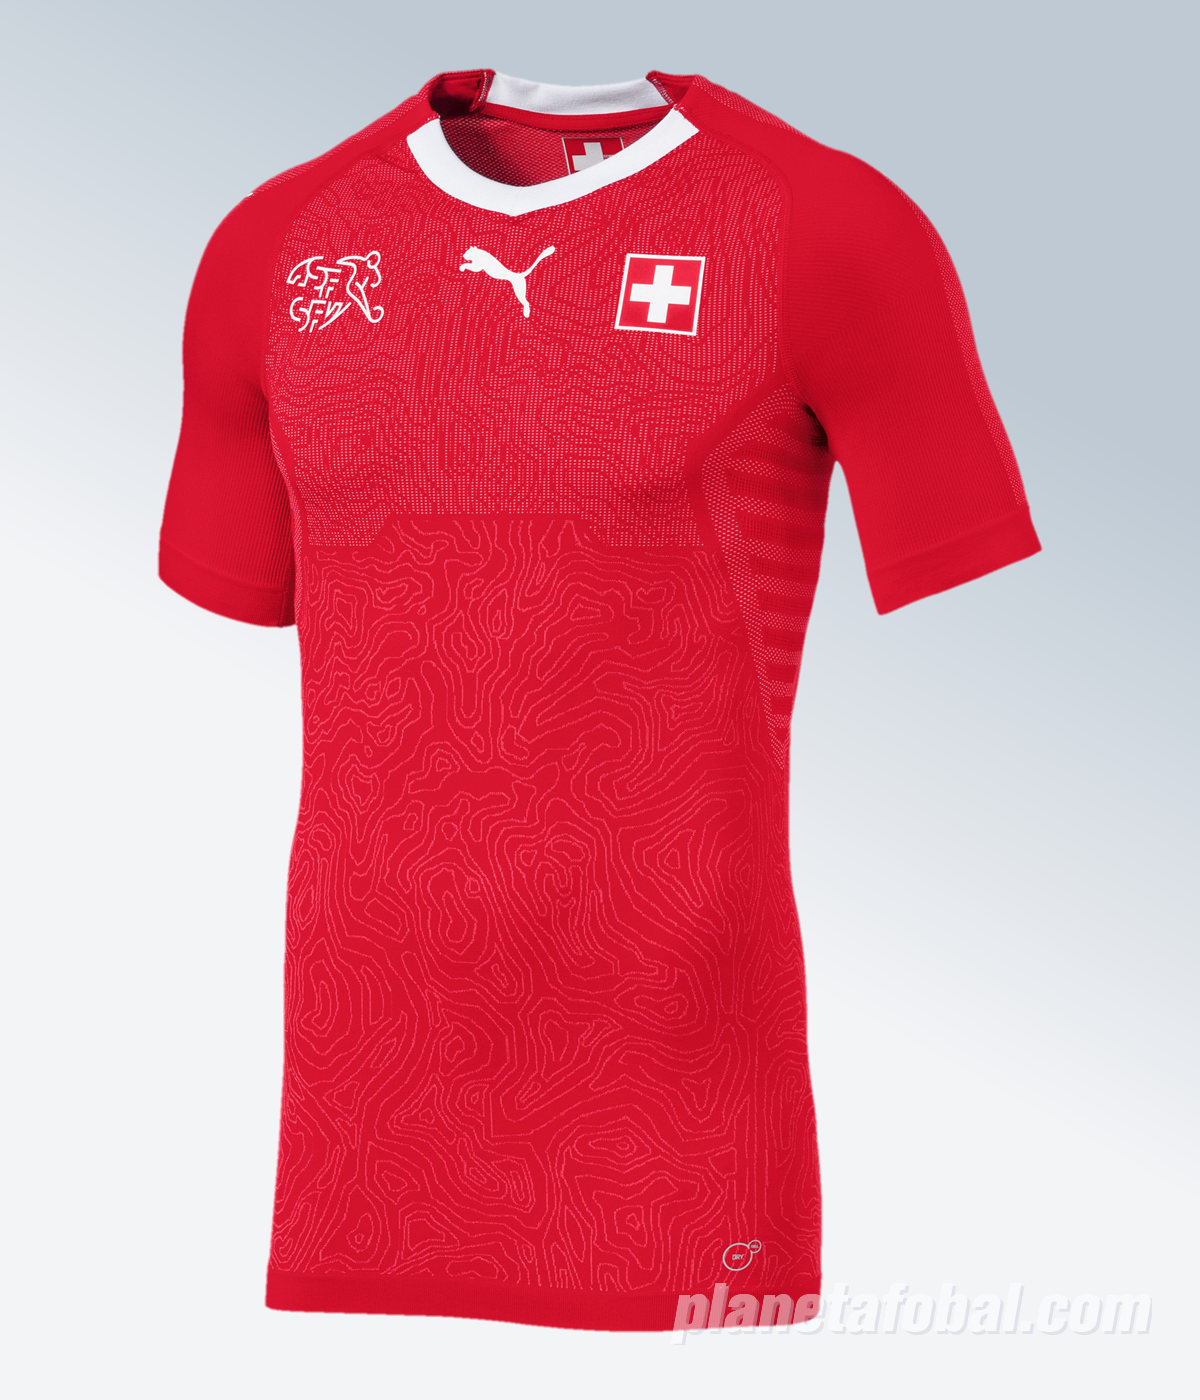 Camiseta titular Puma de Suiza 2018/19